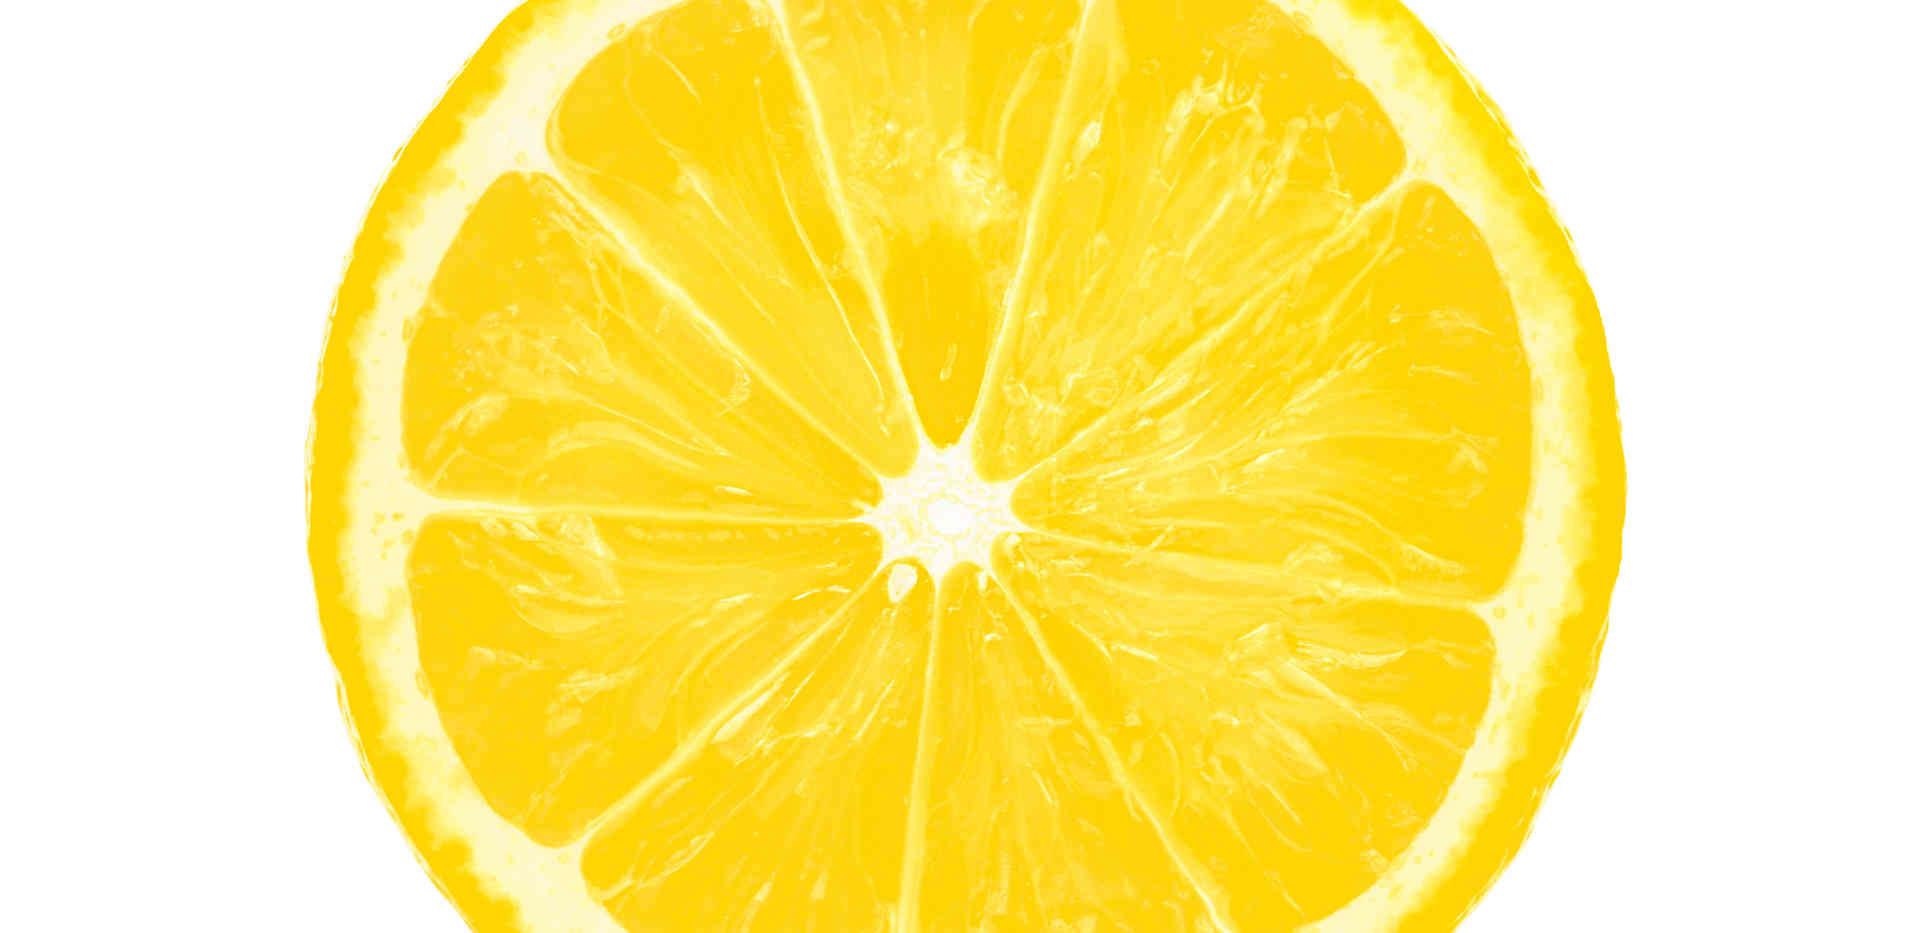 lemon slice half cut isolated on white b